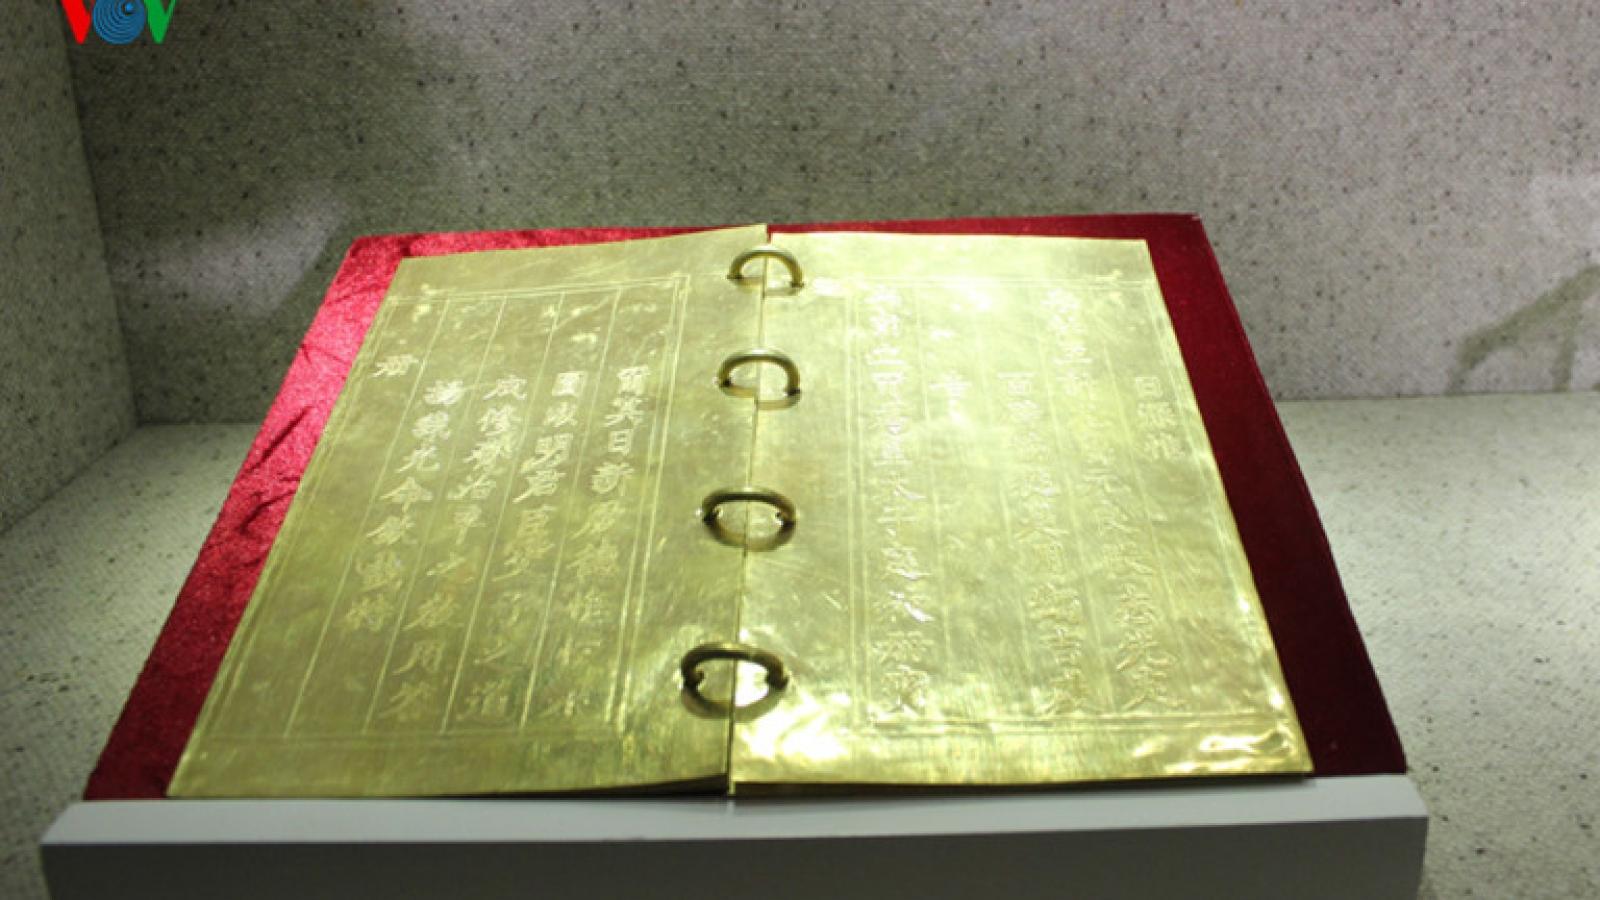 Priceless golden books from Nguyen Dynasty go on exhibit